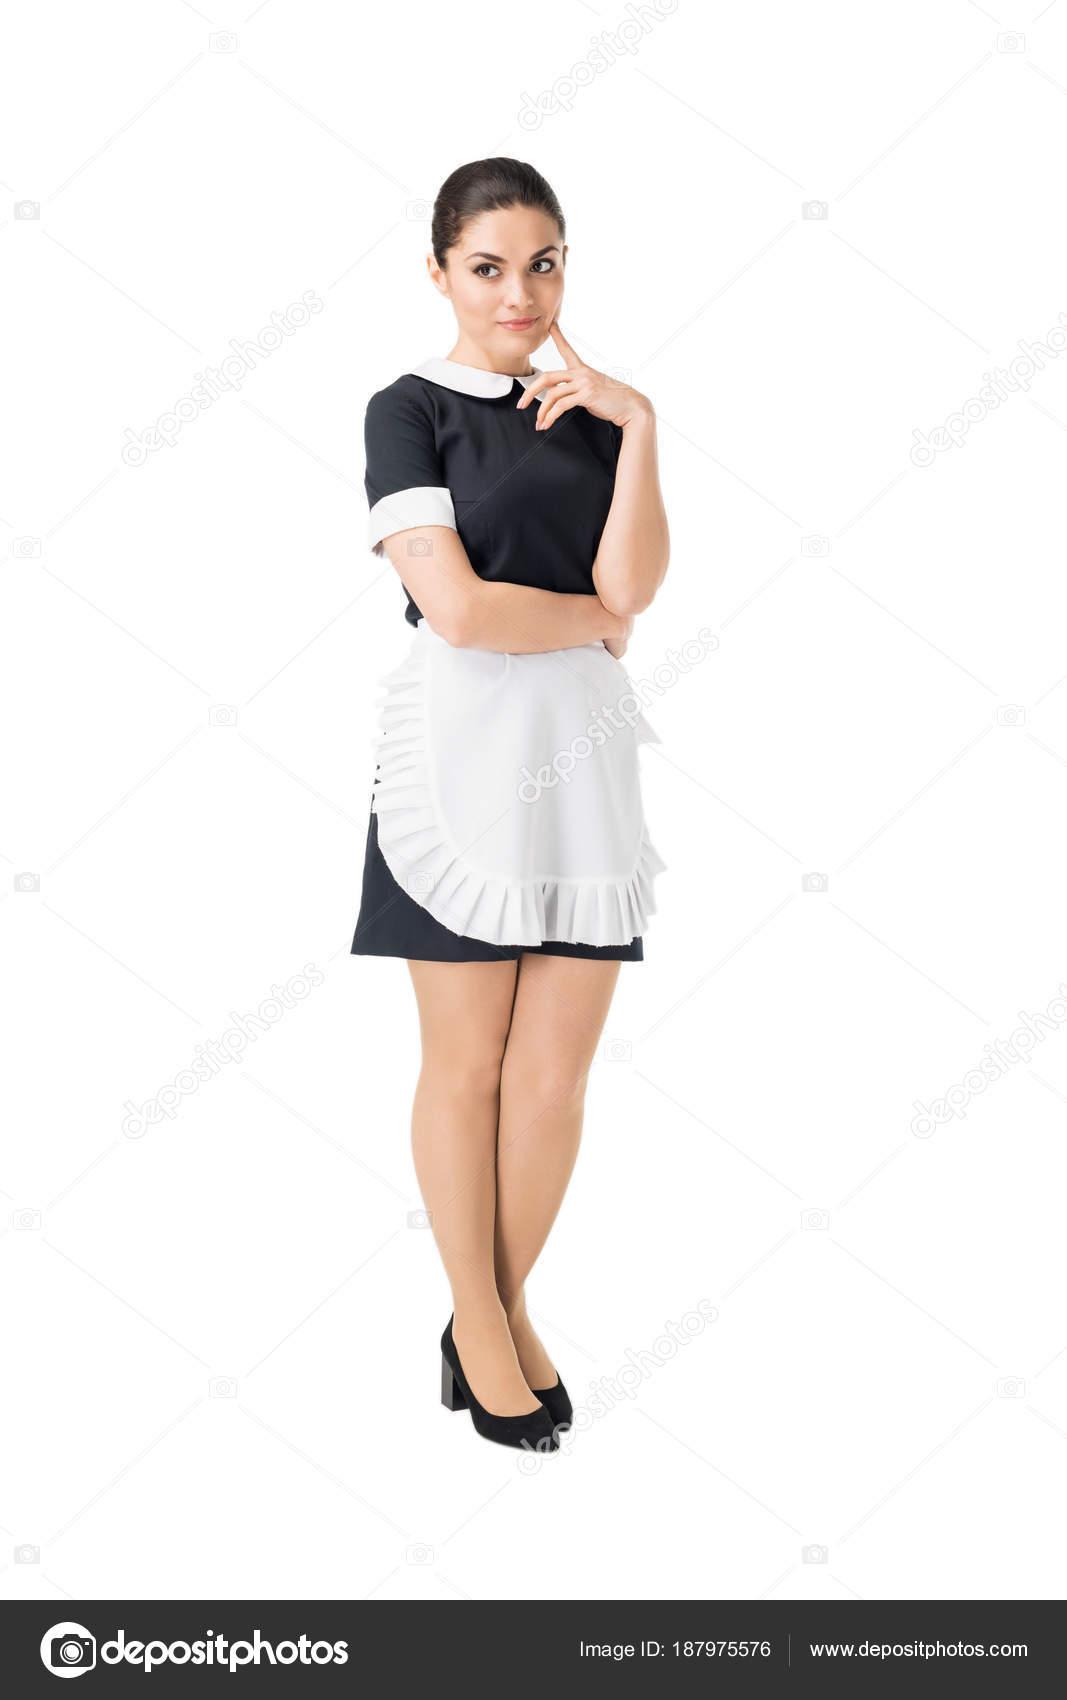 femme m nage brune uniforme professionnel main par visage isol sur photographie. Black Bedroom Furniture Sets. Home Design Ideas